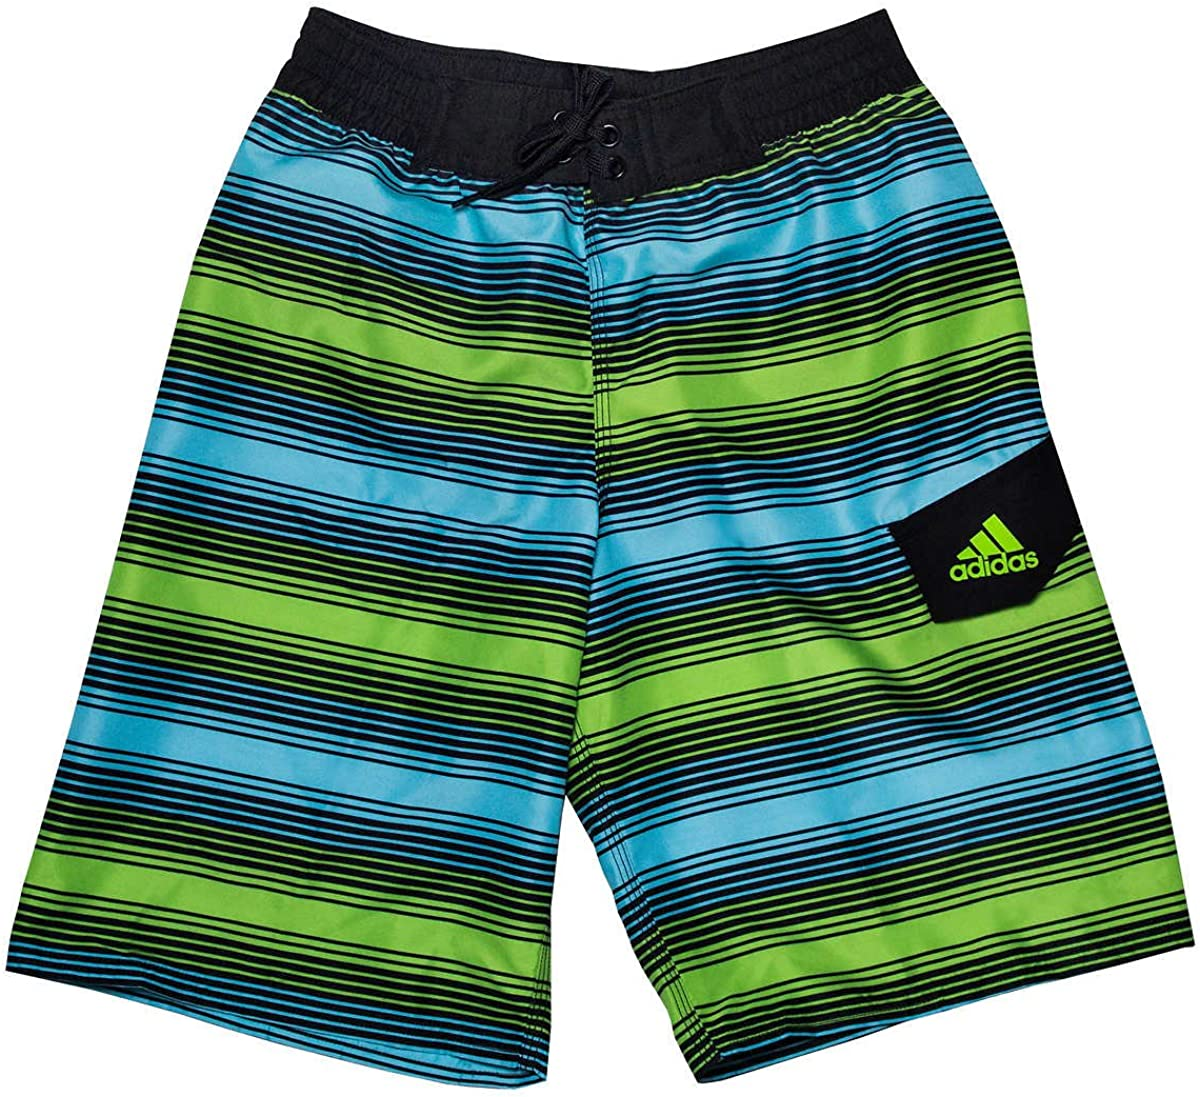 adidas swimming costume age 12